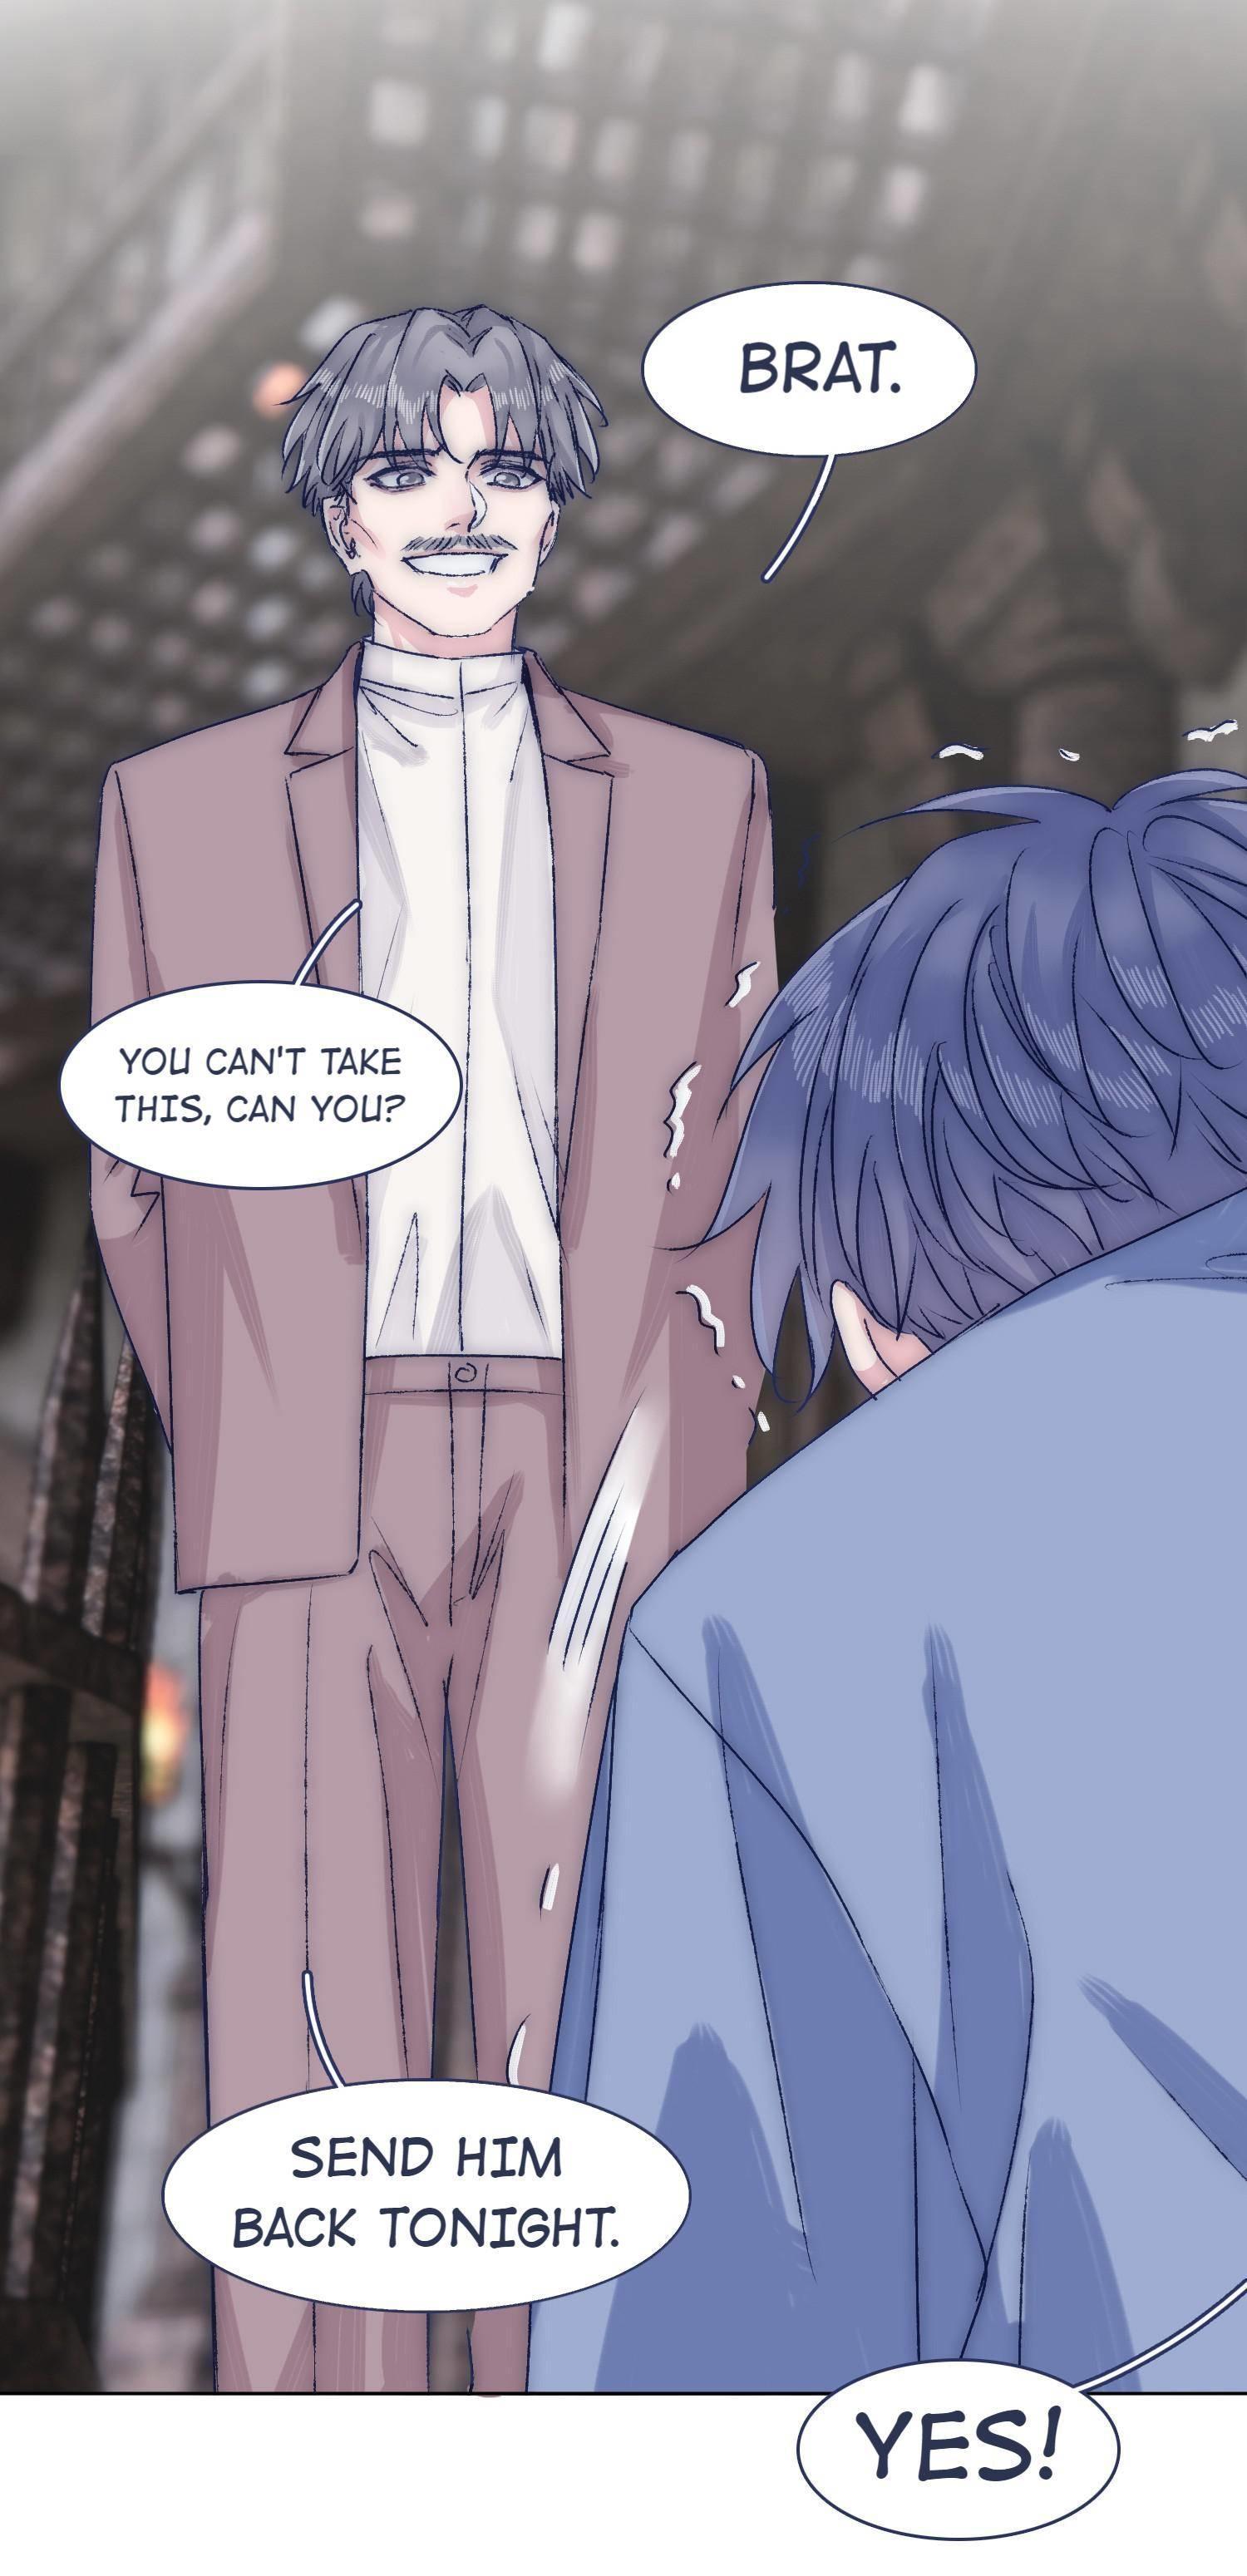 I Offer My Neck To You Chapter 72 page 18 - Mangakakalot